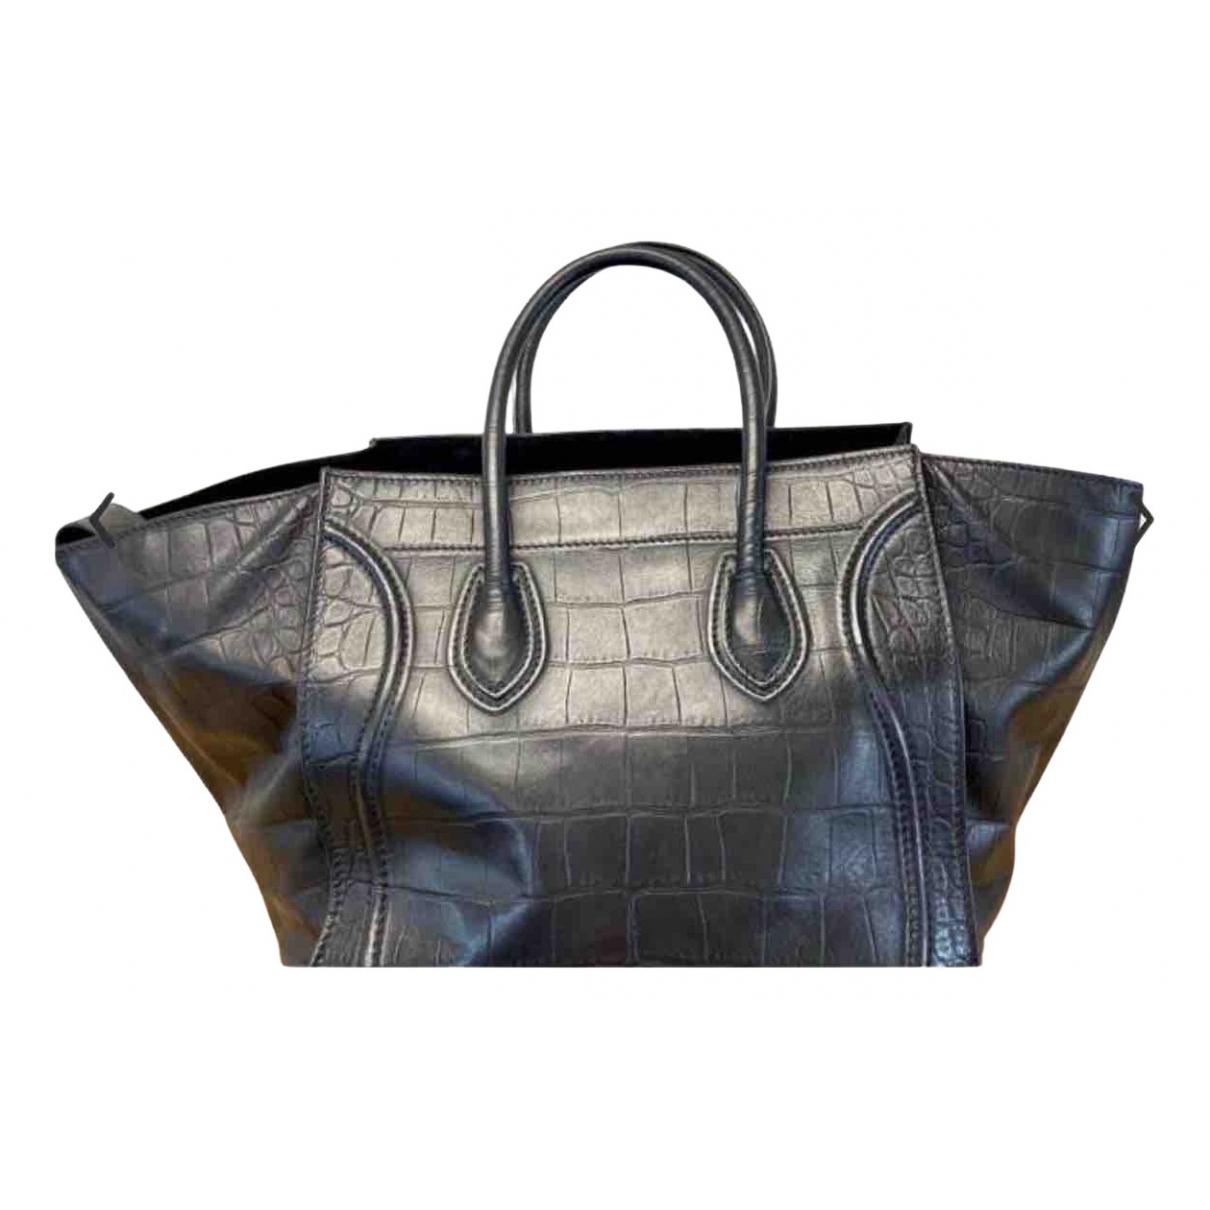 Celine Luggage Phantom Black Leather handbag for Women \N